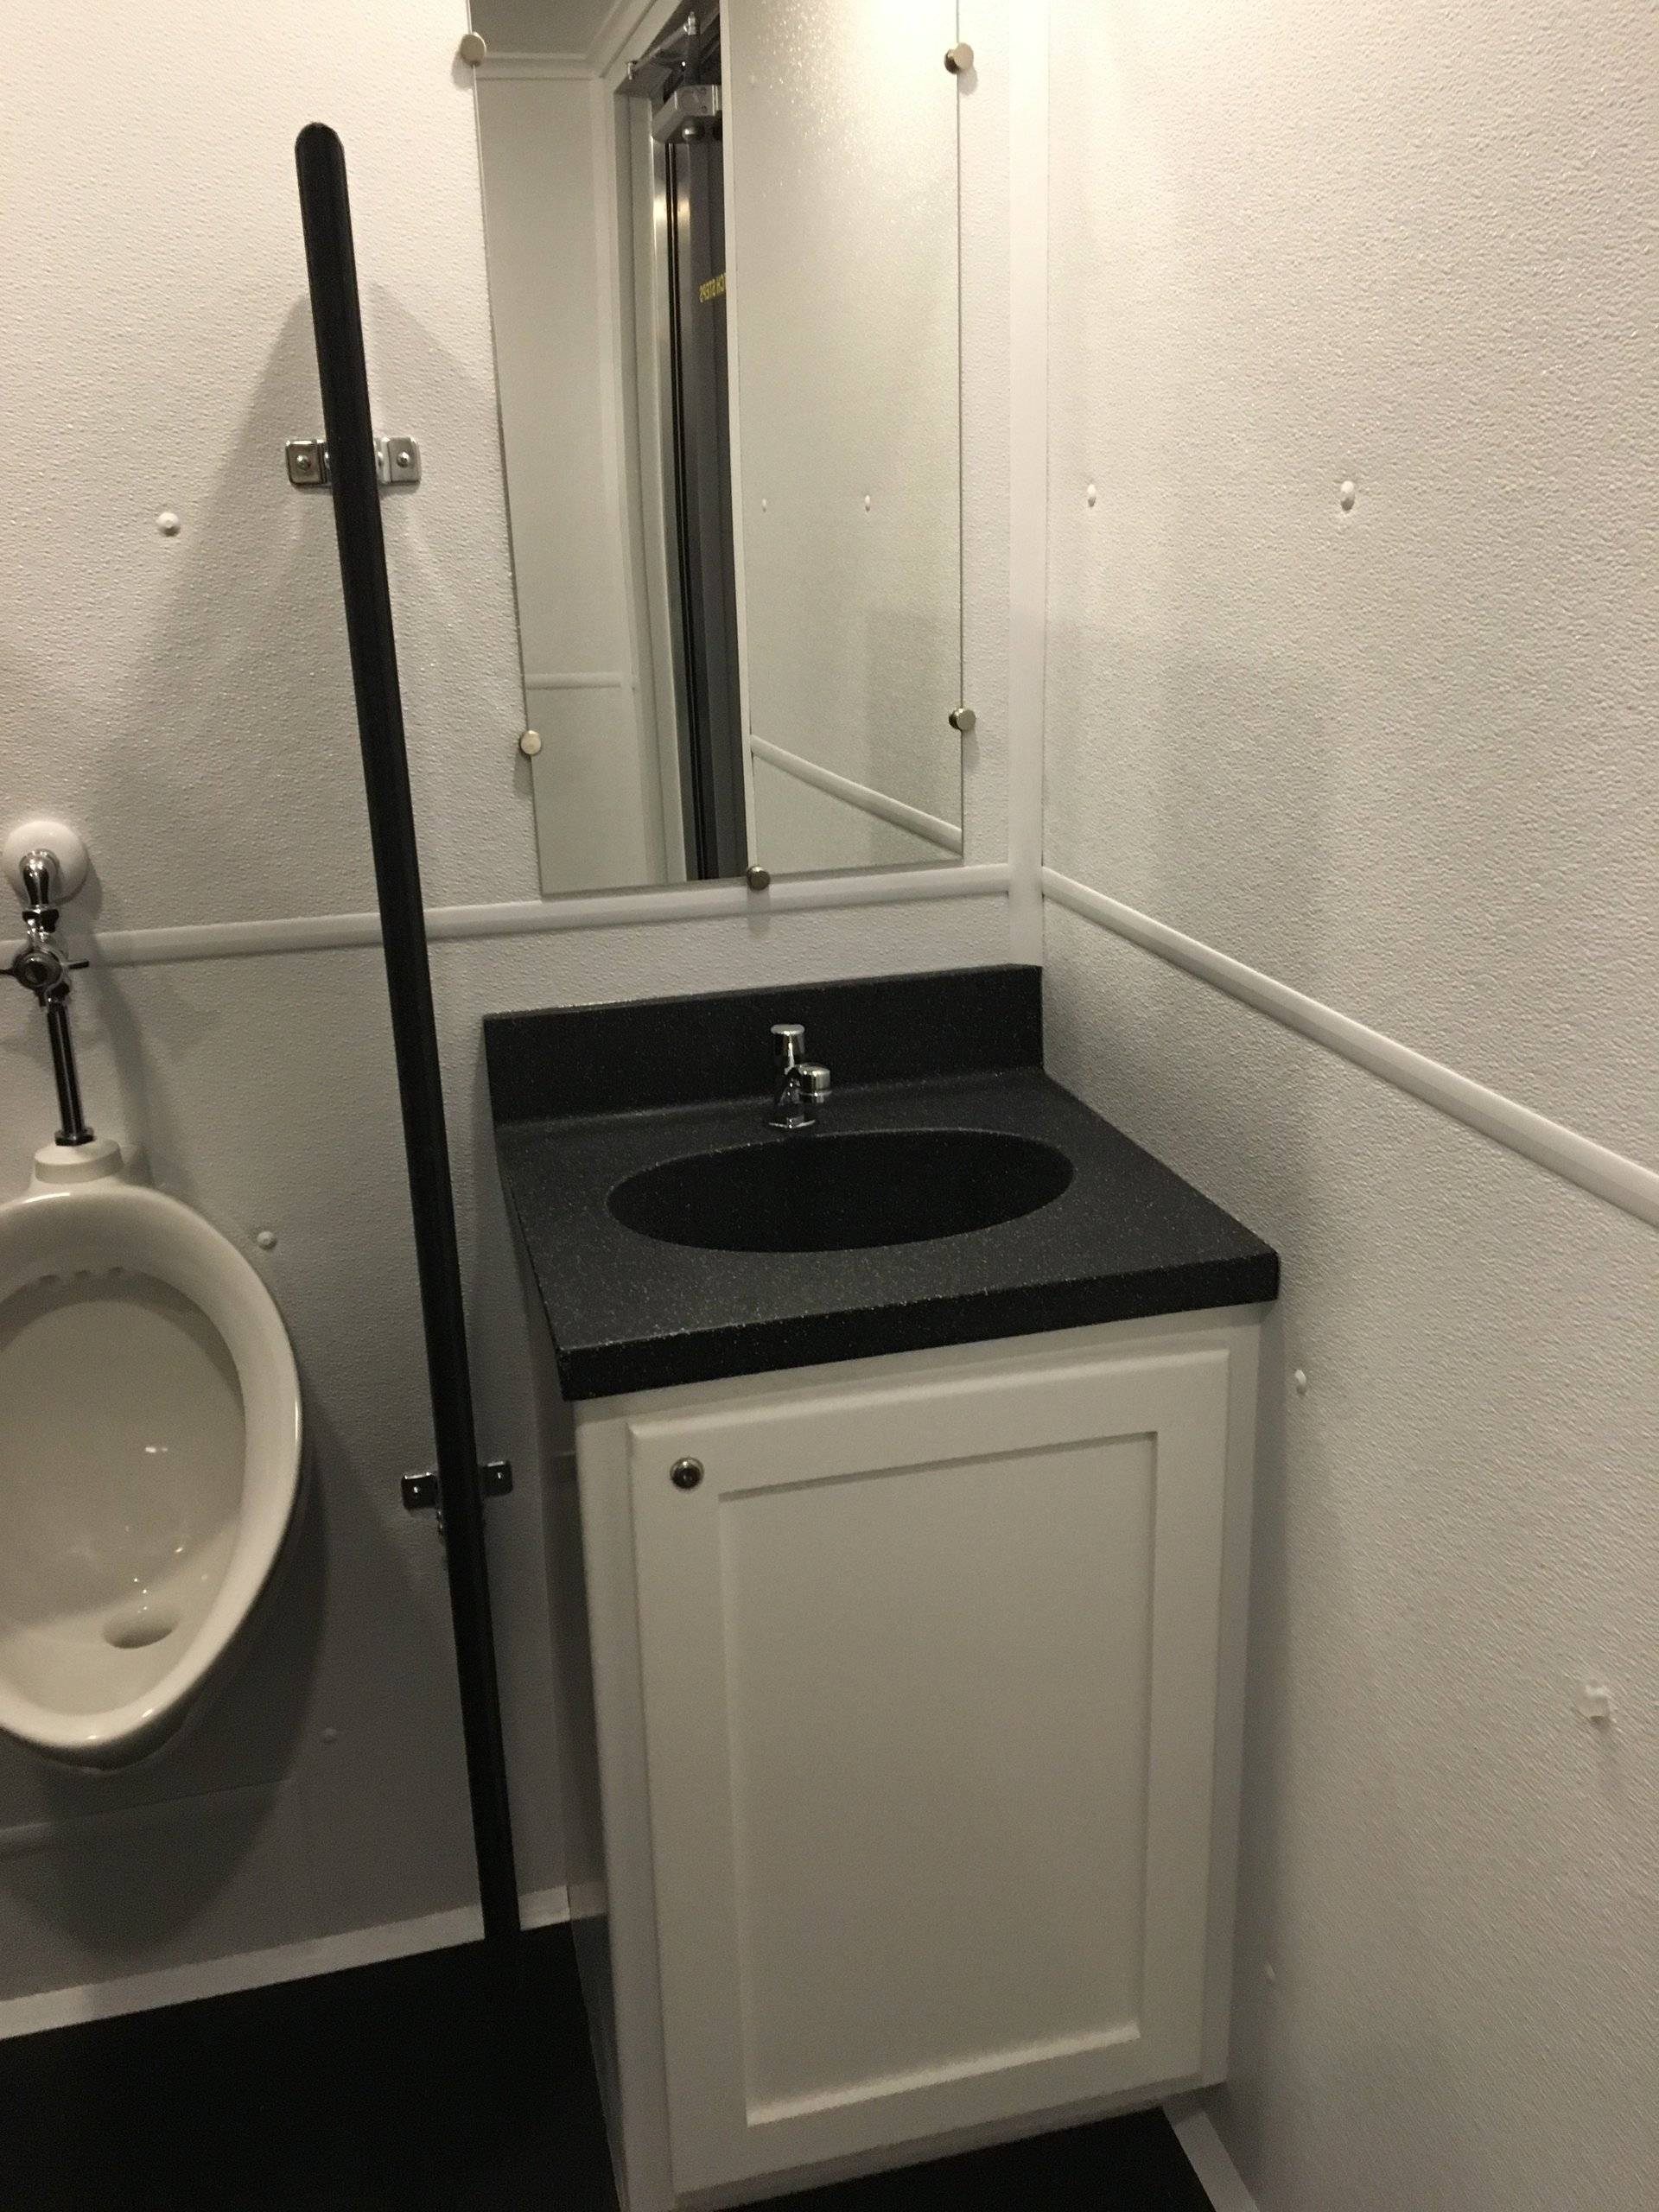 Portable Toilet Products Dothan Al Portable Toilet